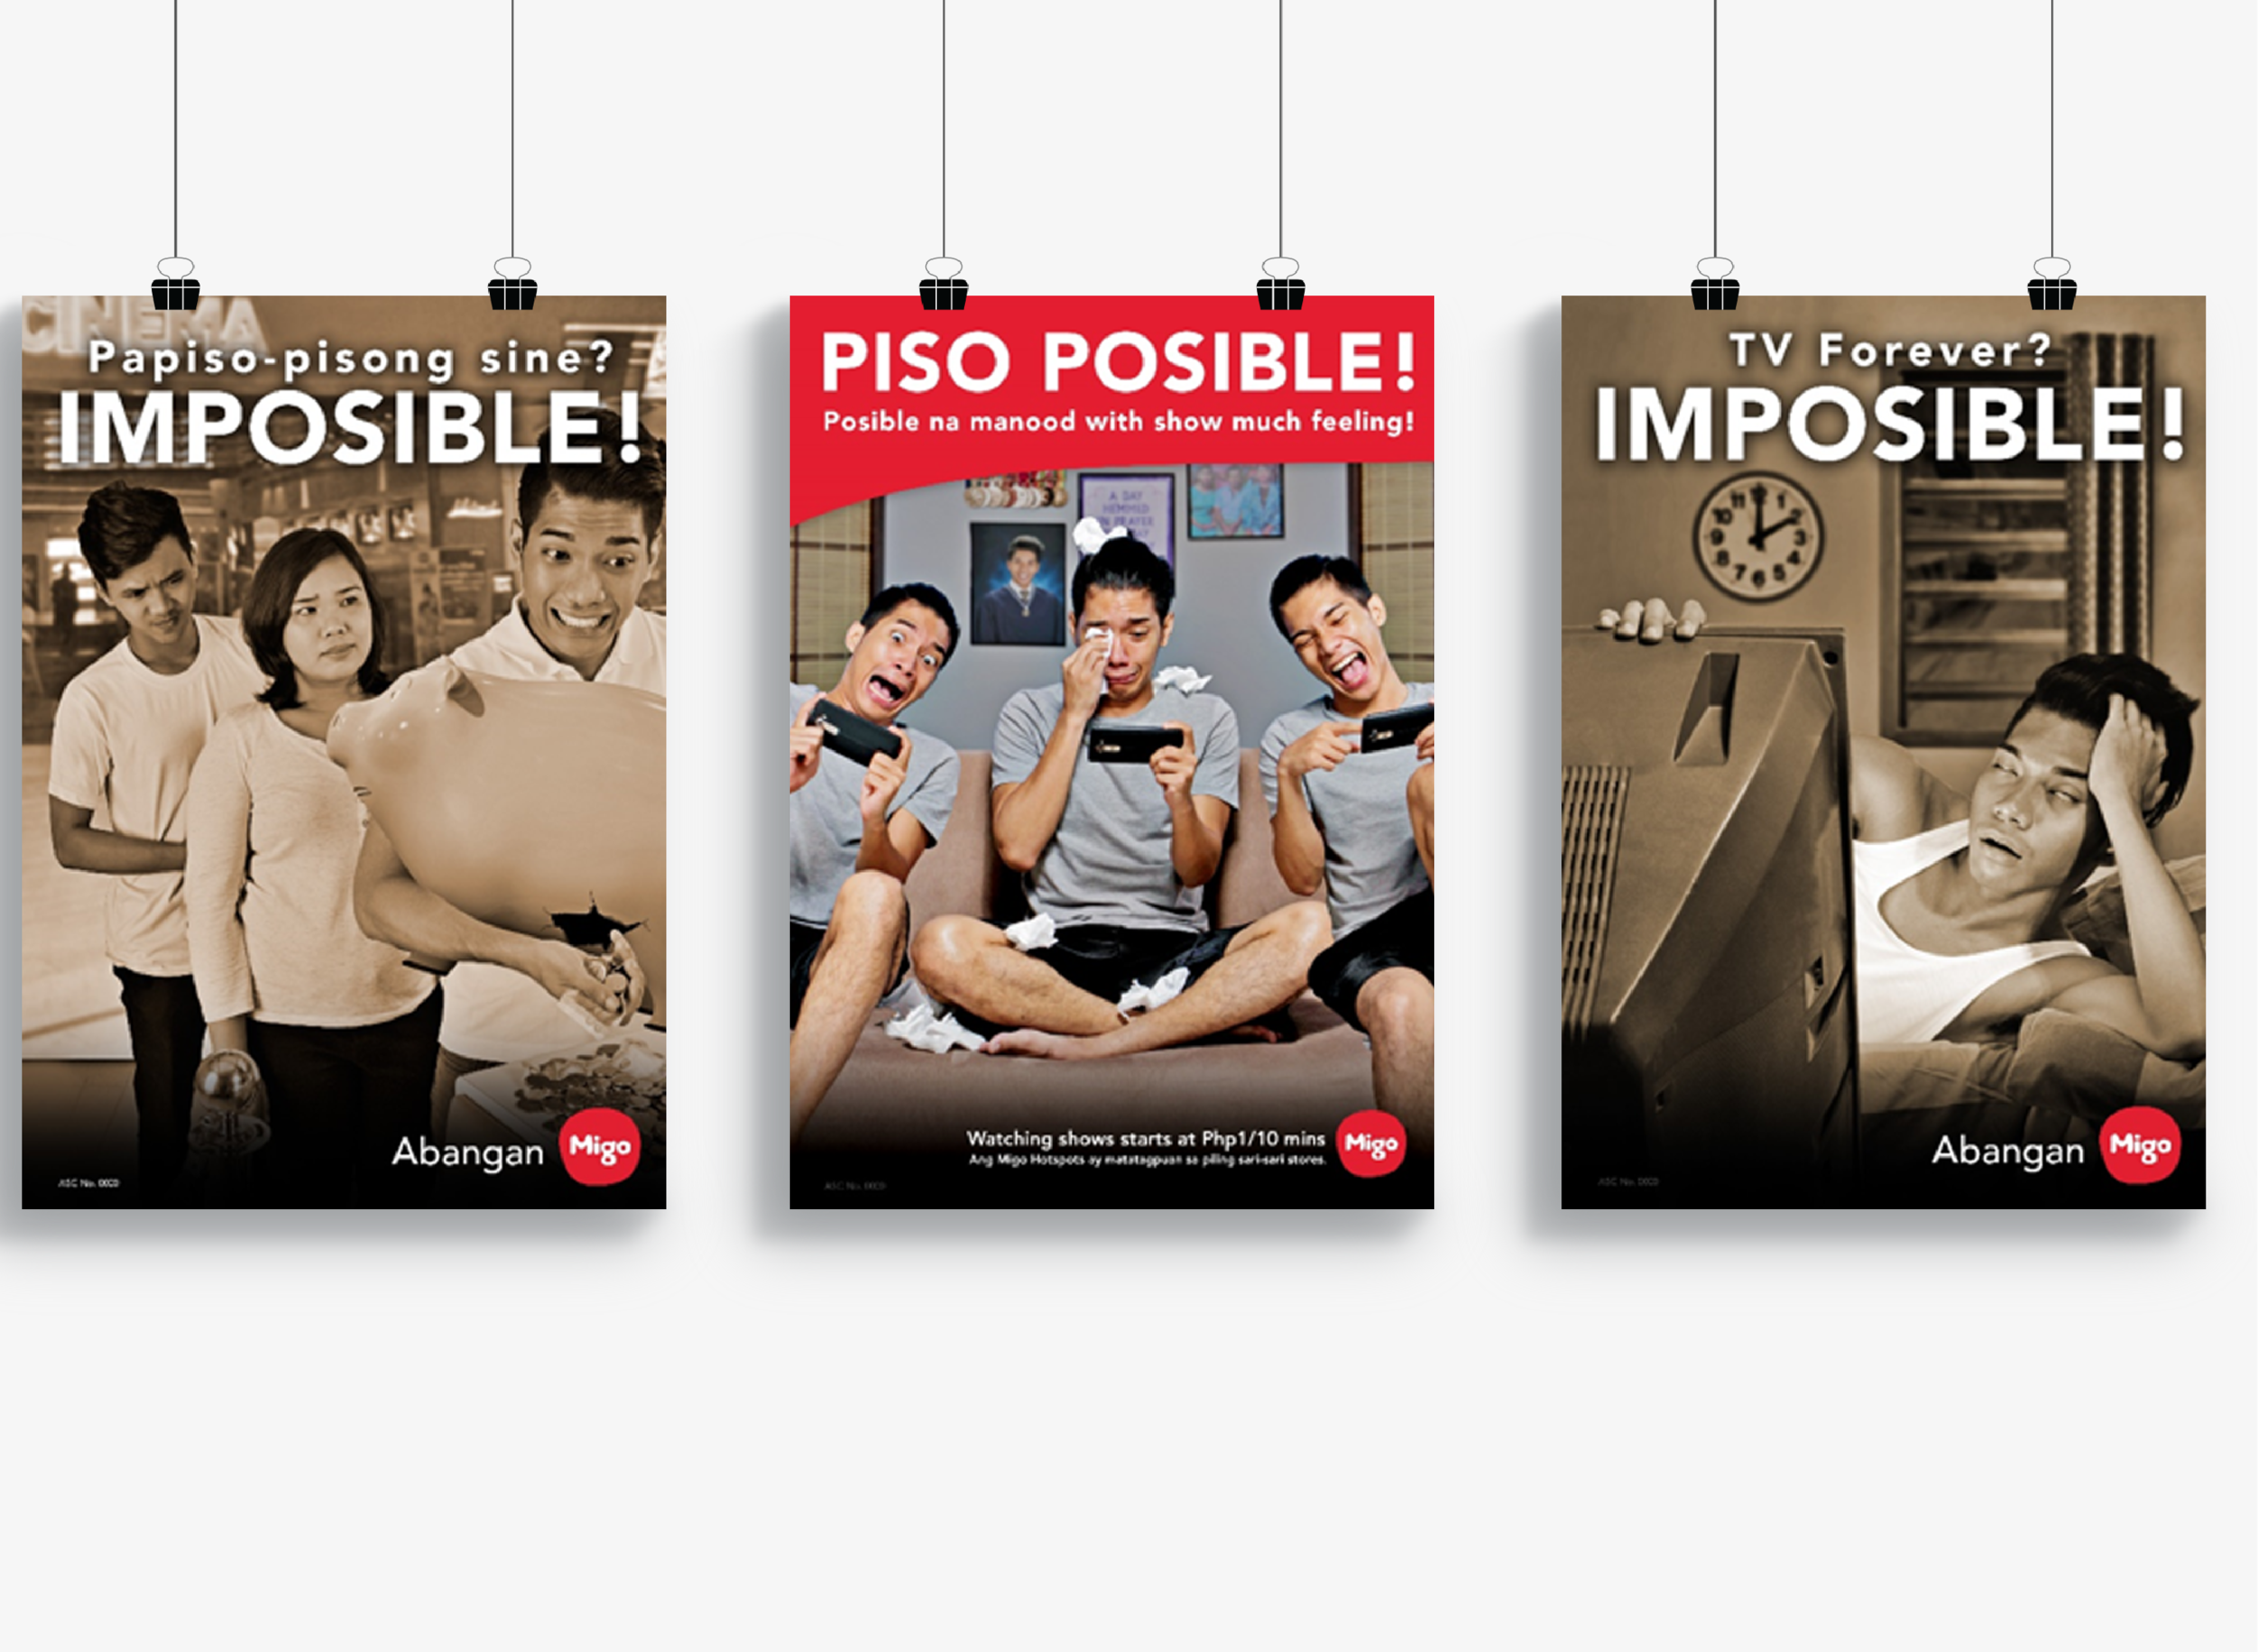 PISO POSIBLE!  : Marketing Campaign for Migo Entertainment